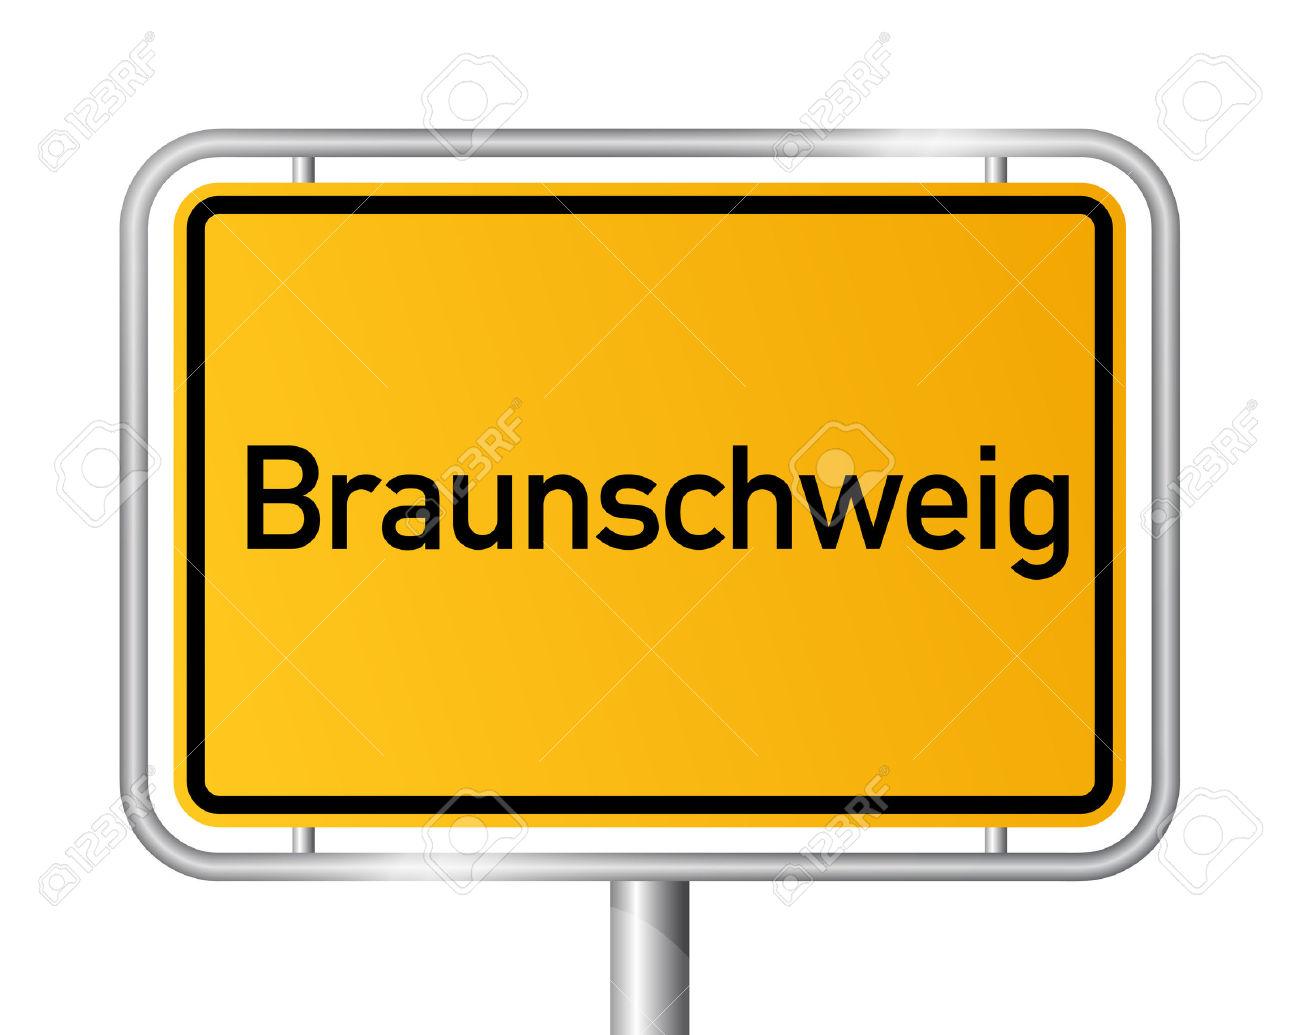 City Limit Sign Braunschweig.